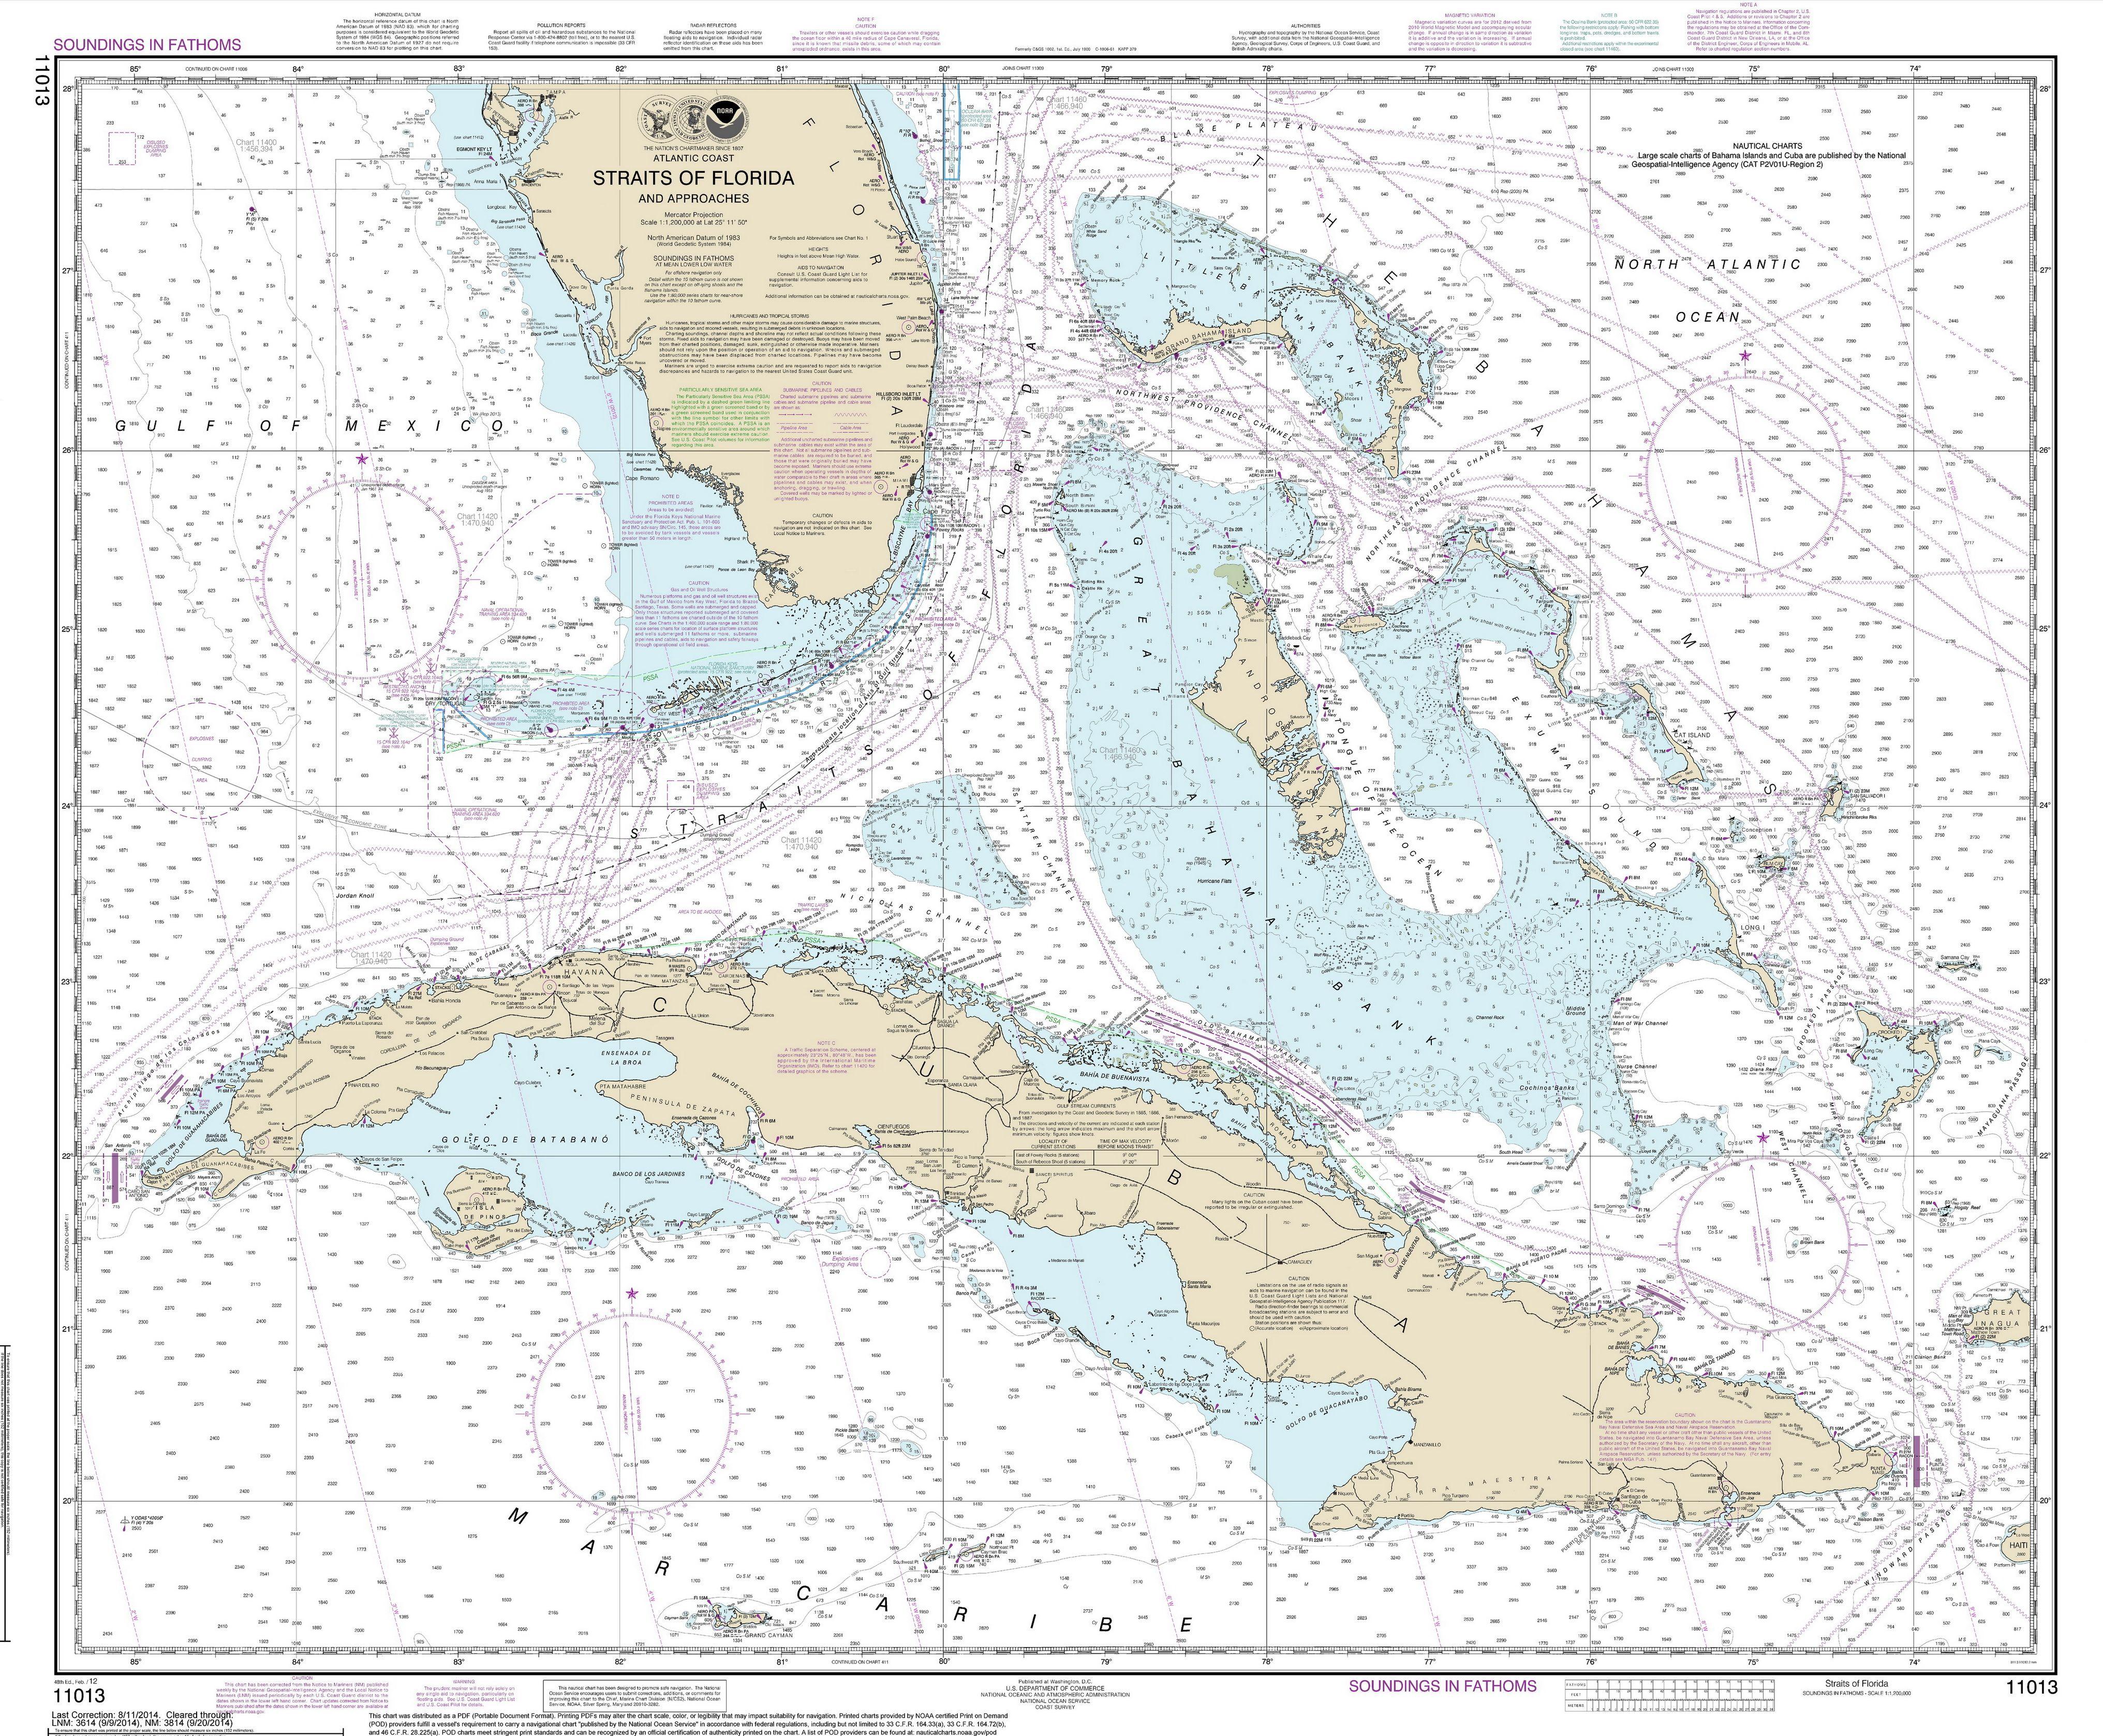 Modern Nautical Maps Of Florida 1 400 000 Scale Charts